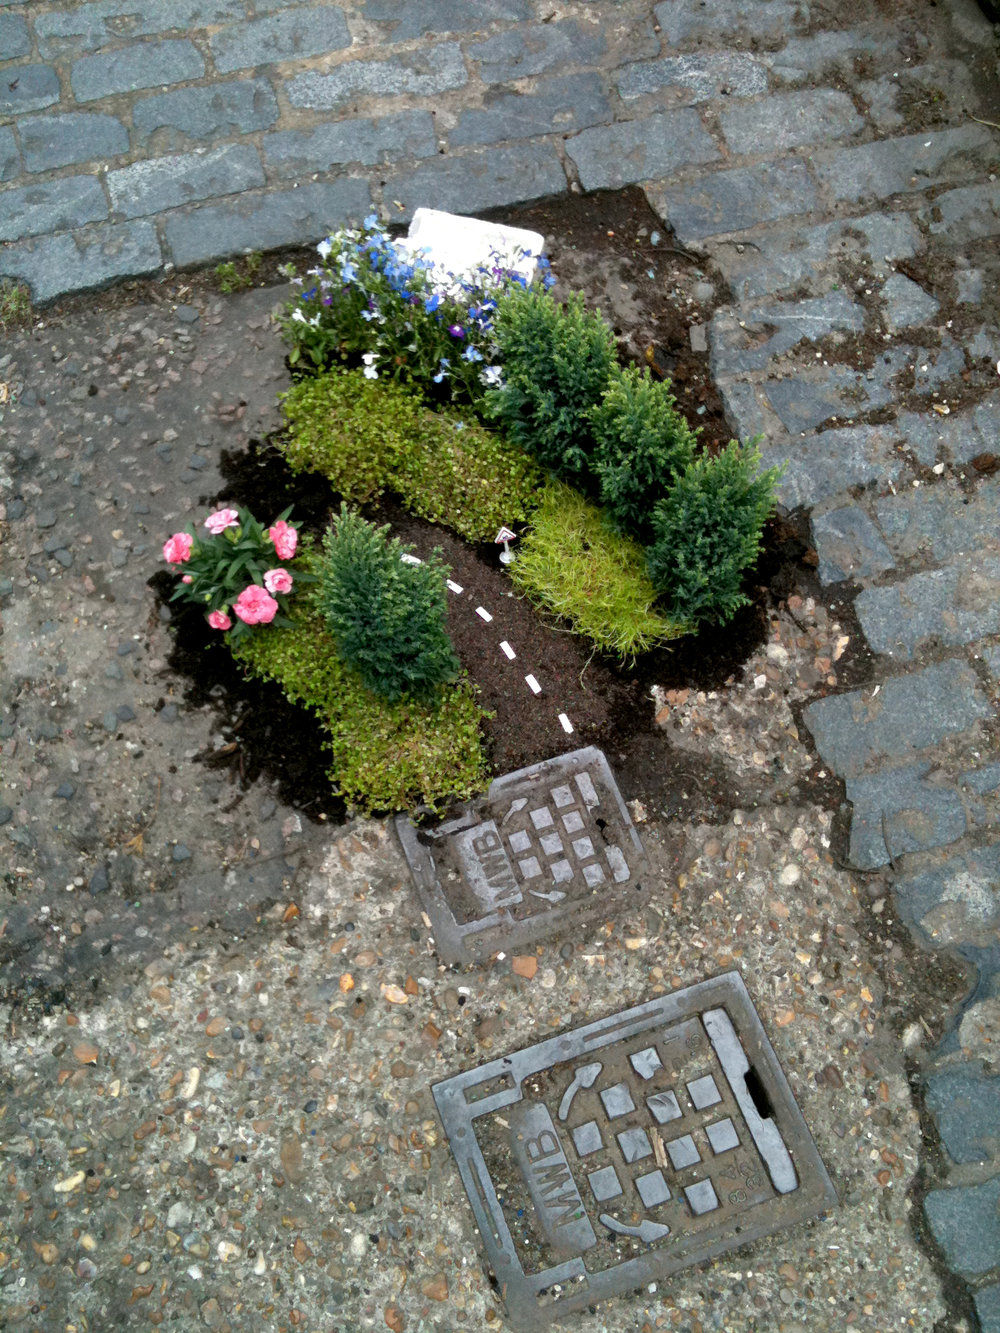 Pothole Garden confused.com steve wheen